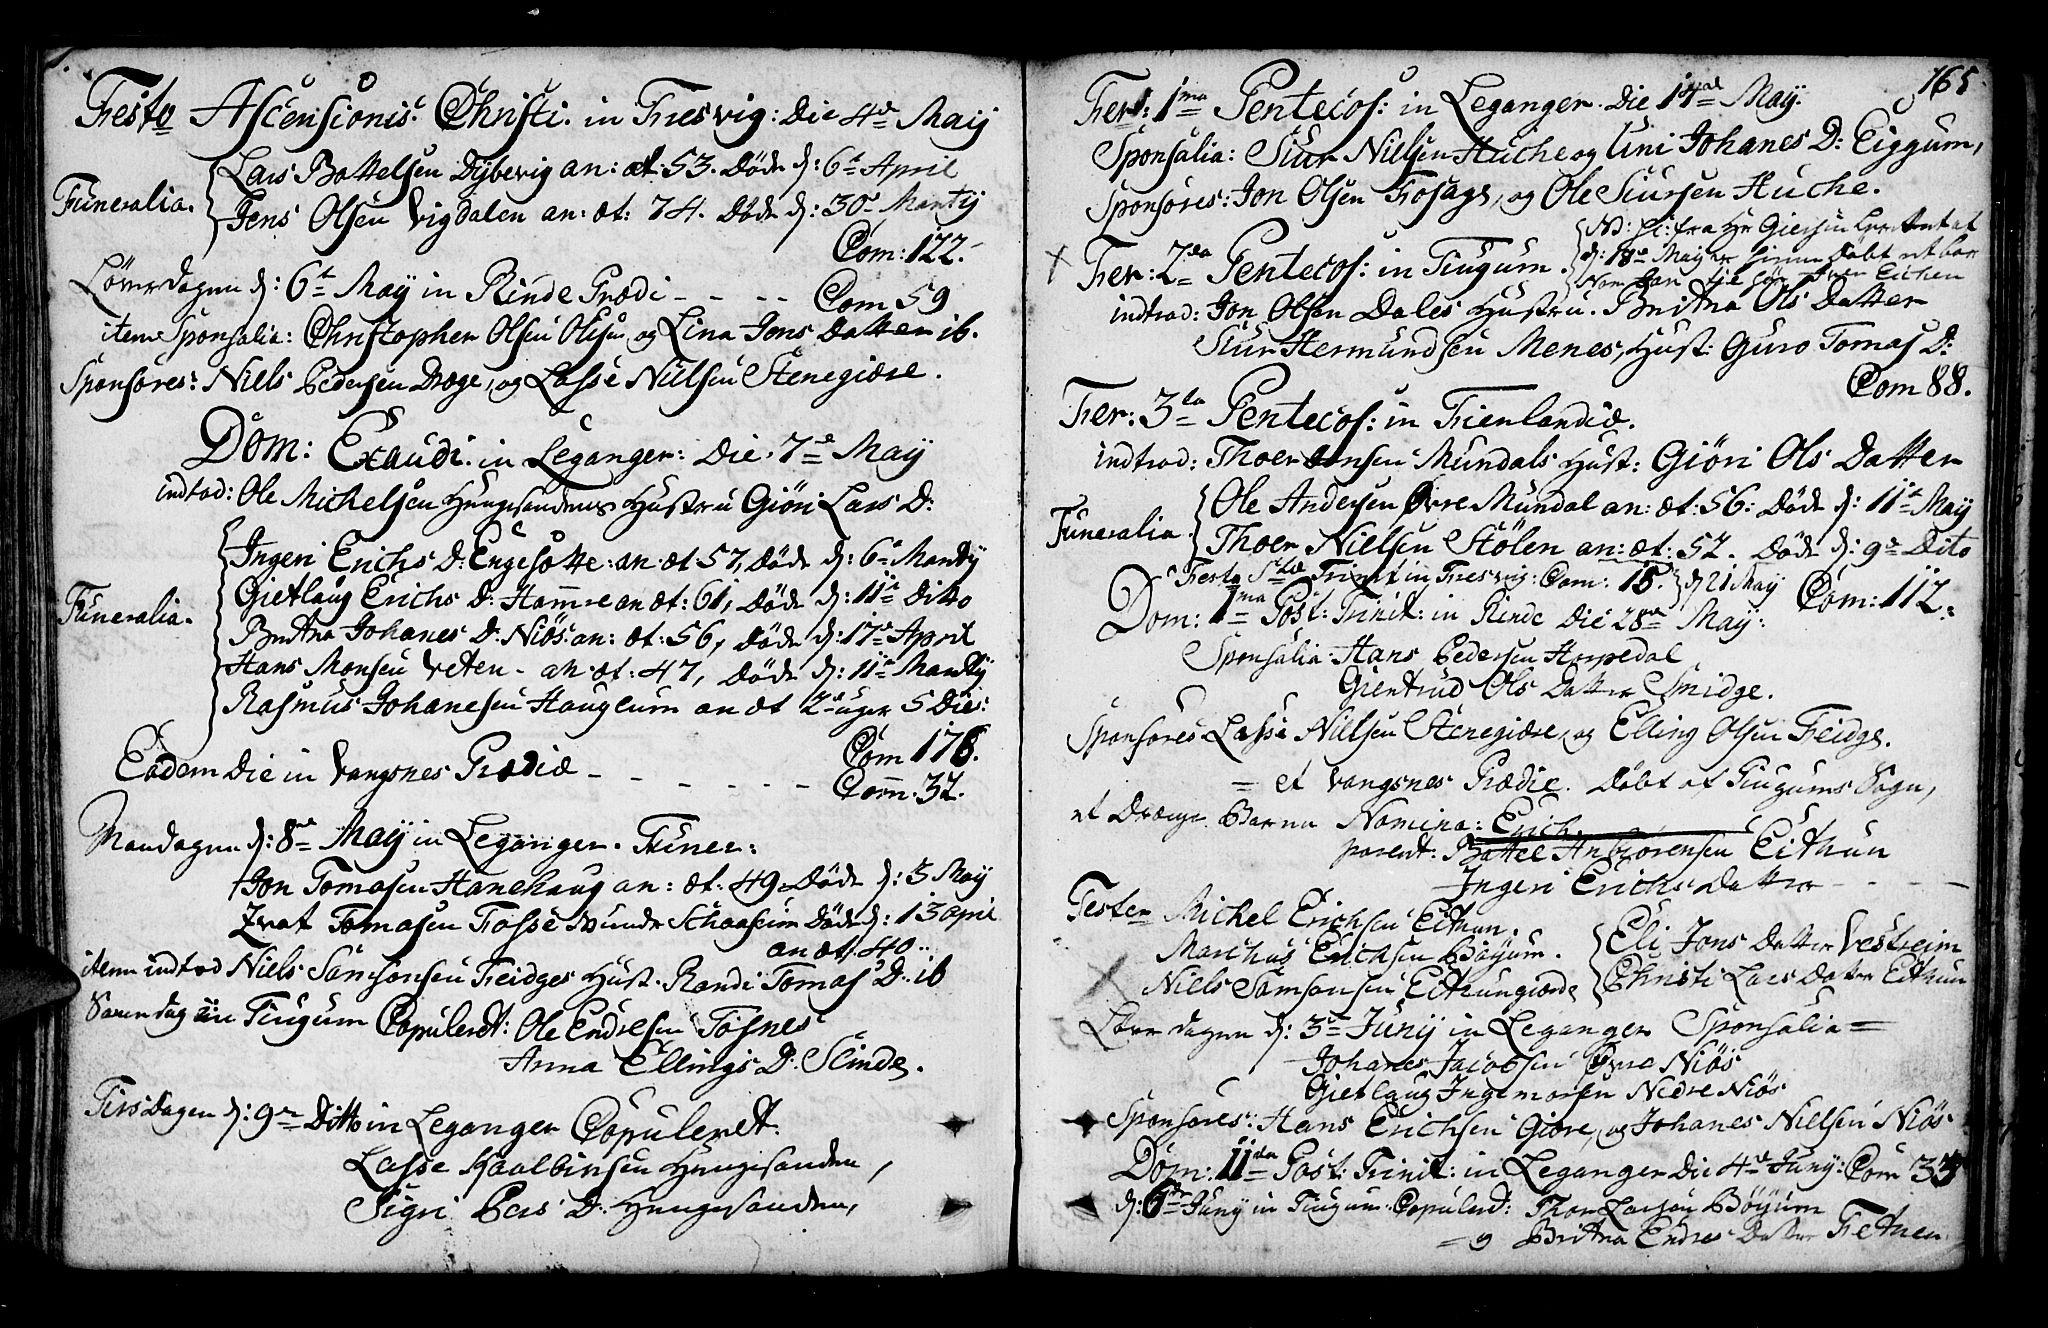 SAB, Leikanger Sokneprestembete, Ministerialbok nr. A 3, 1756-1770, s. 165